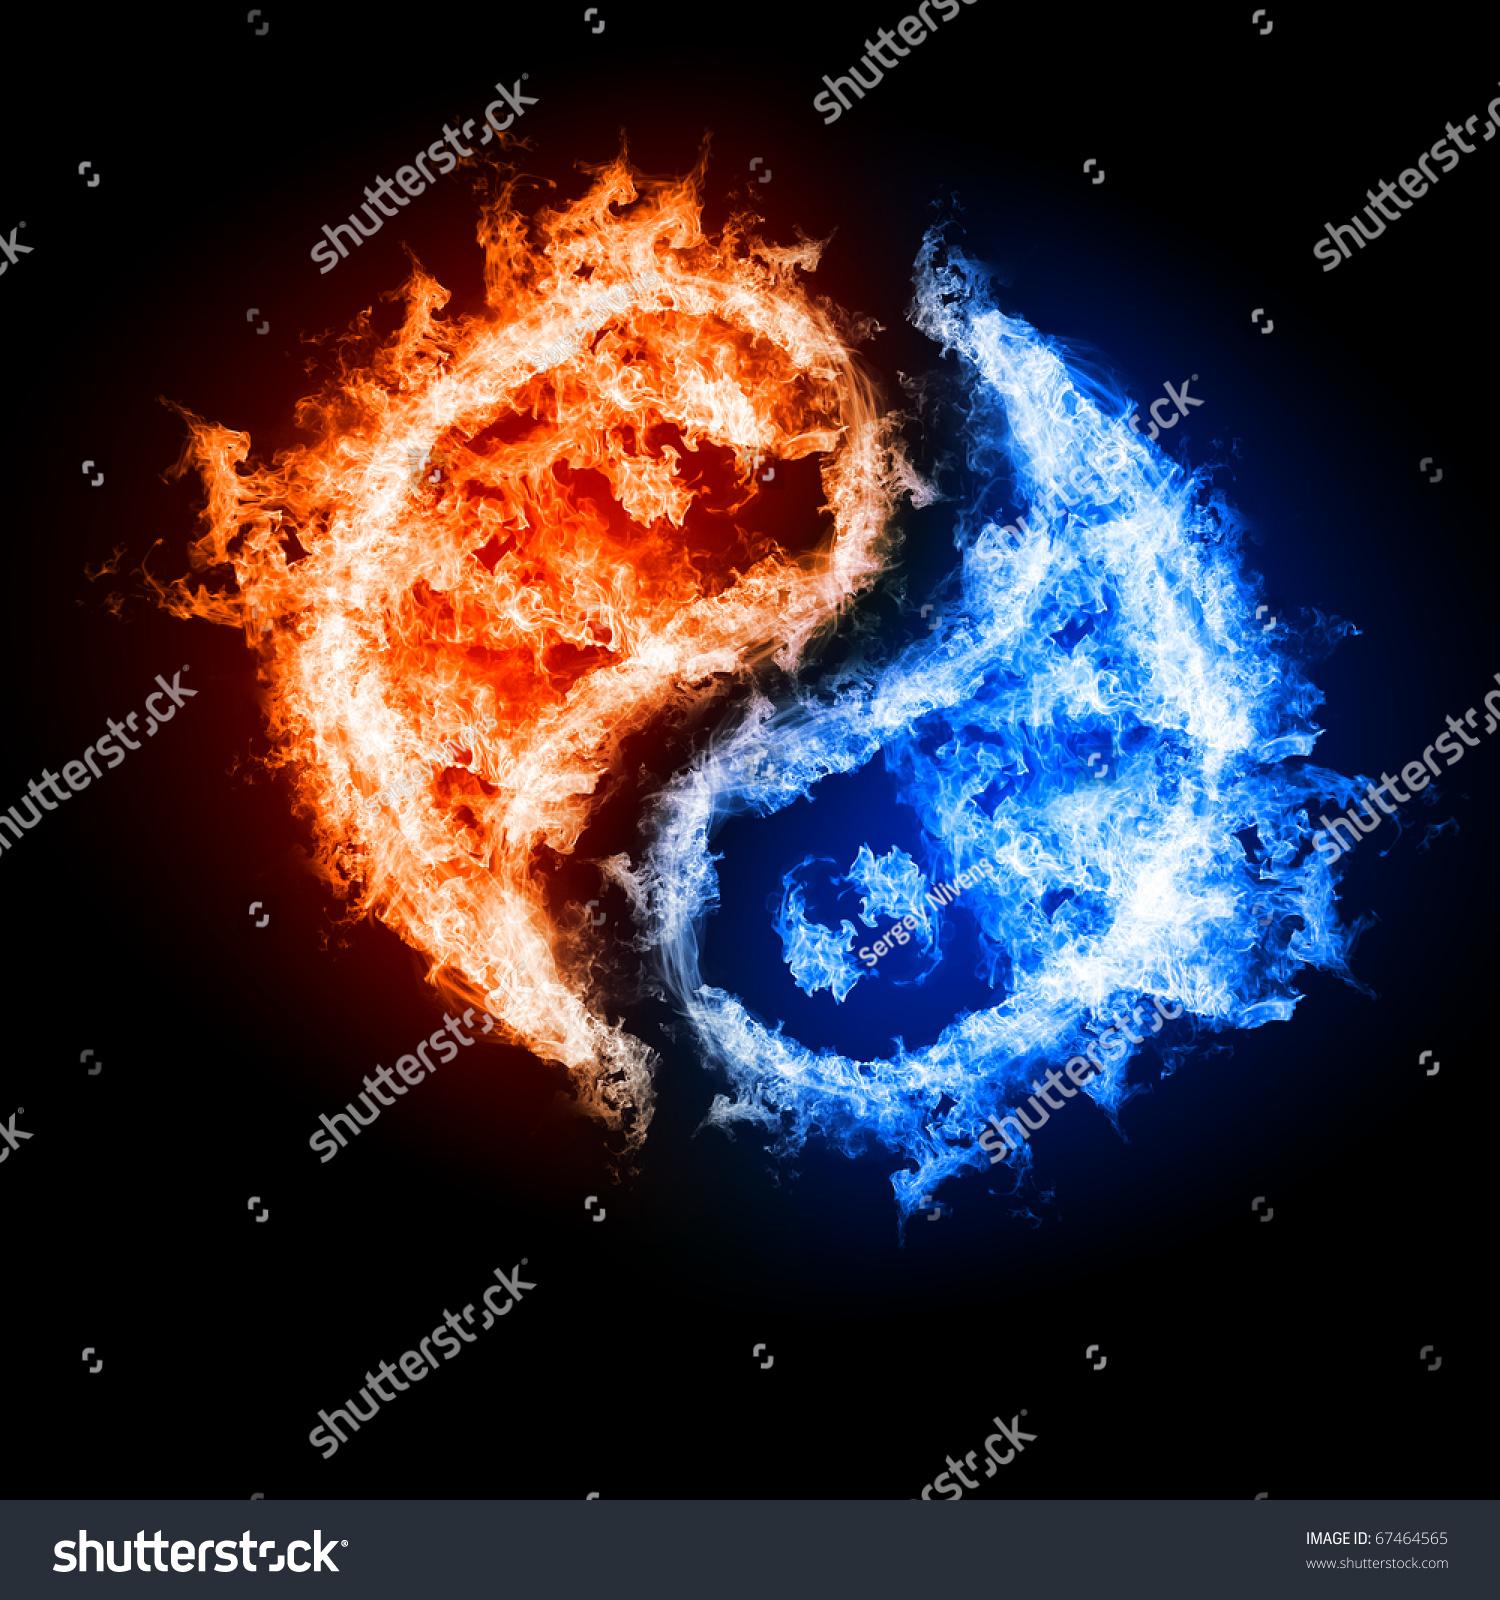 symbol yin yang dark background form stock illustration fireplace clipart fireplace clip art modern rectangle